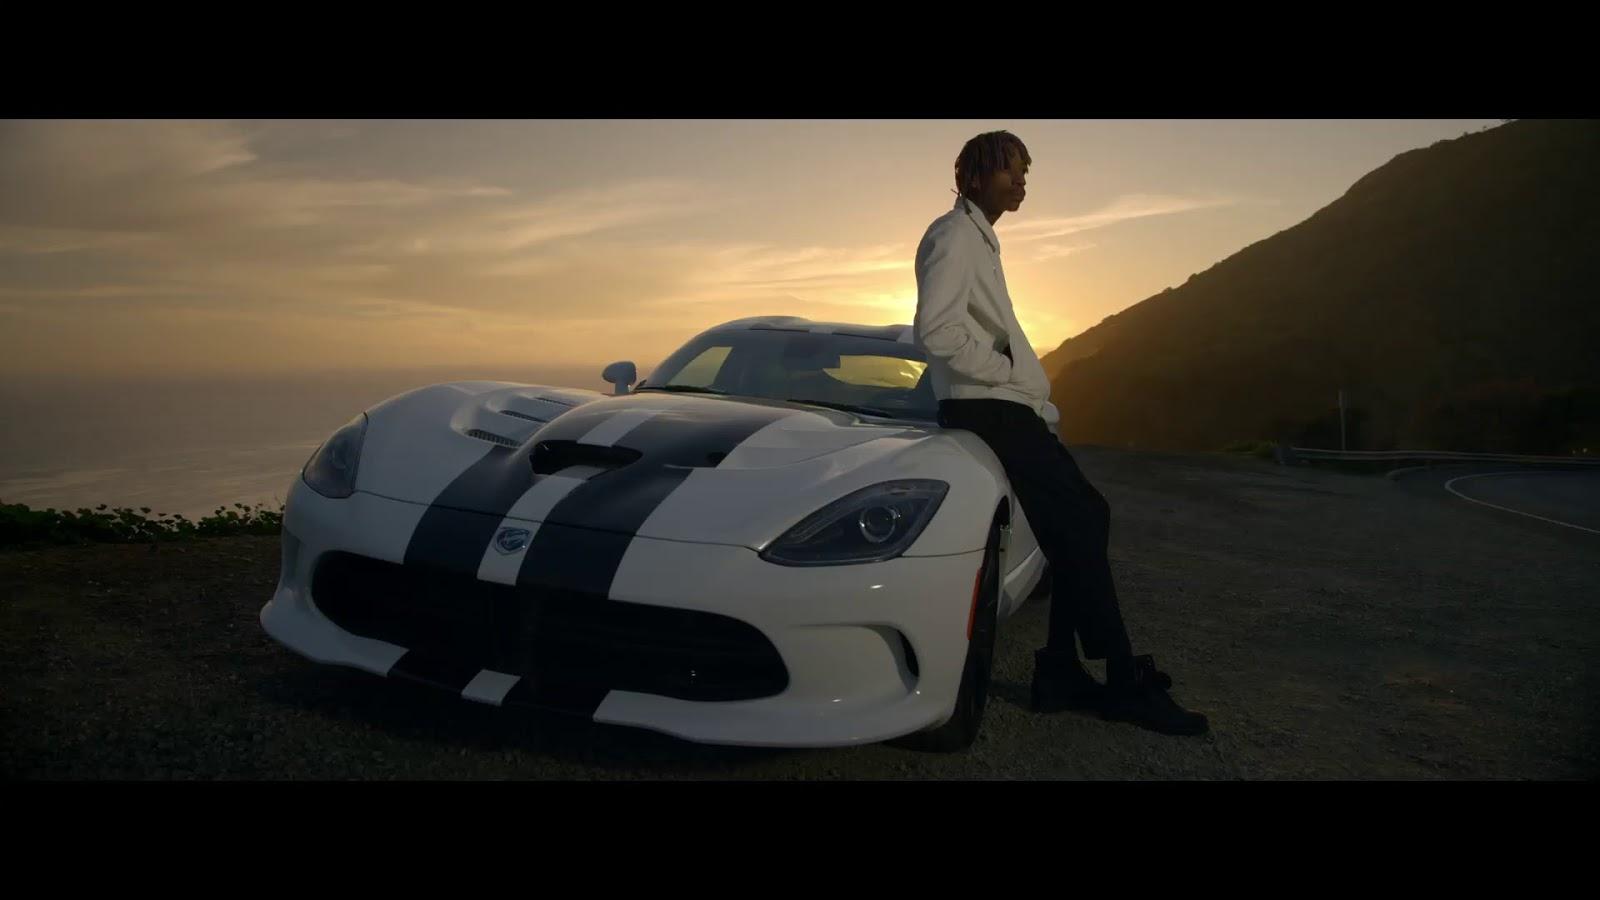 Wiz Khalifa - See You Again ft. Charlie Puth - Viral Video marketing